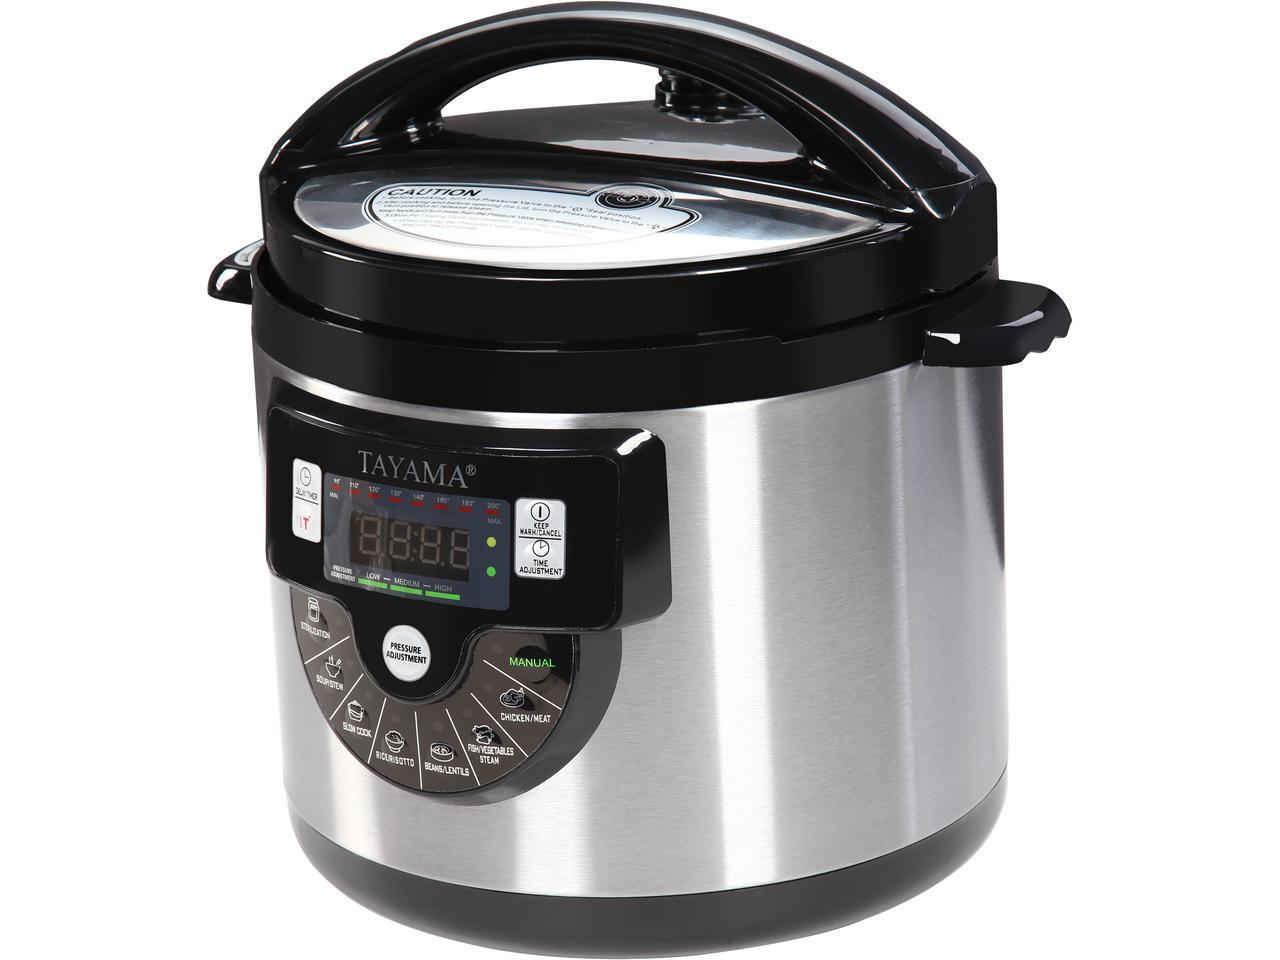 Tayama tmc 60xl 6 quart 8 in 1 multi function for Multi cooker